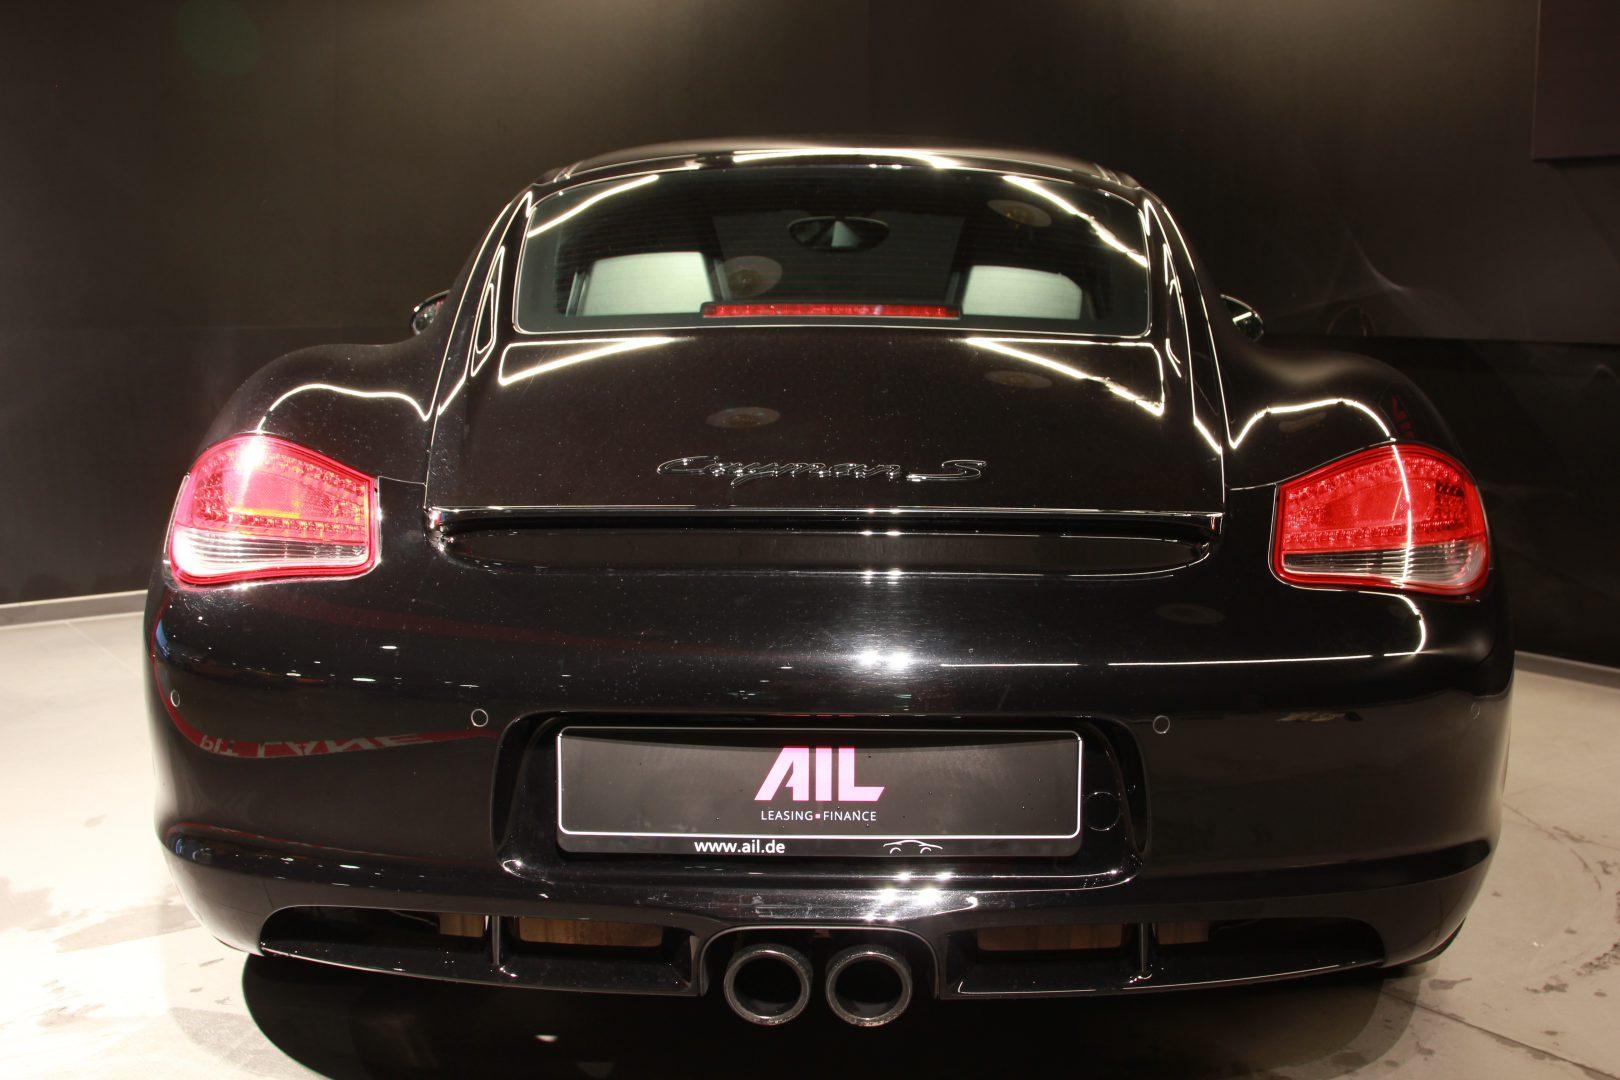 AIL Porsche Cayman S Black Edition PDK Sport Chrono 8